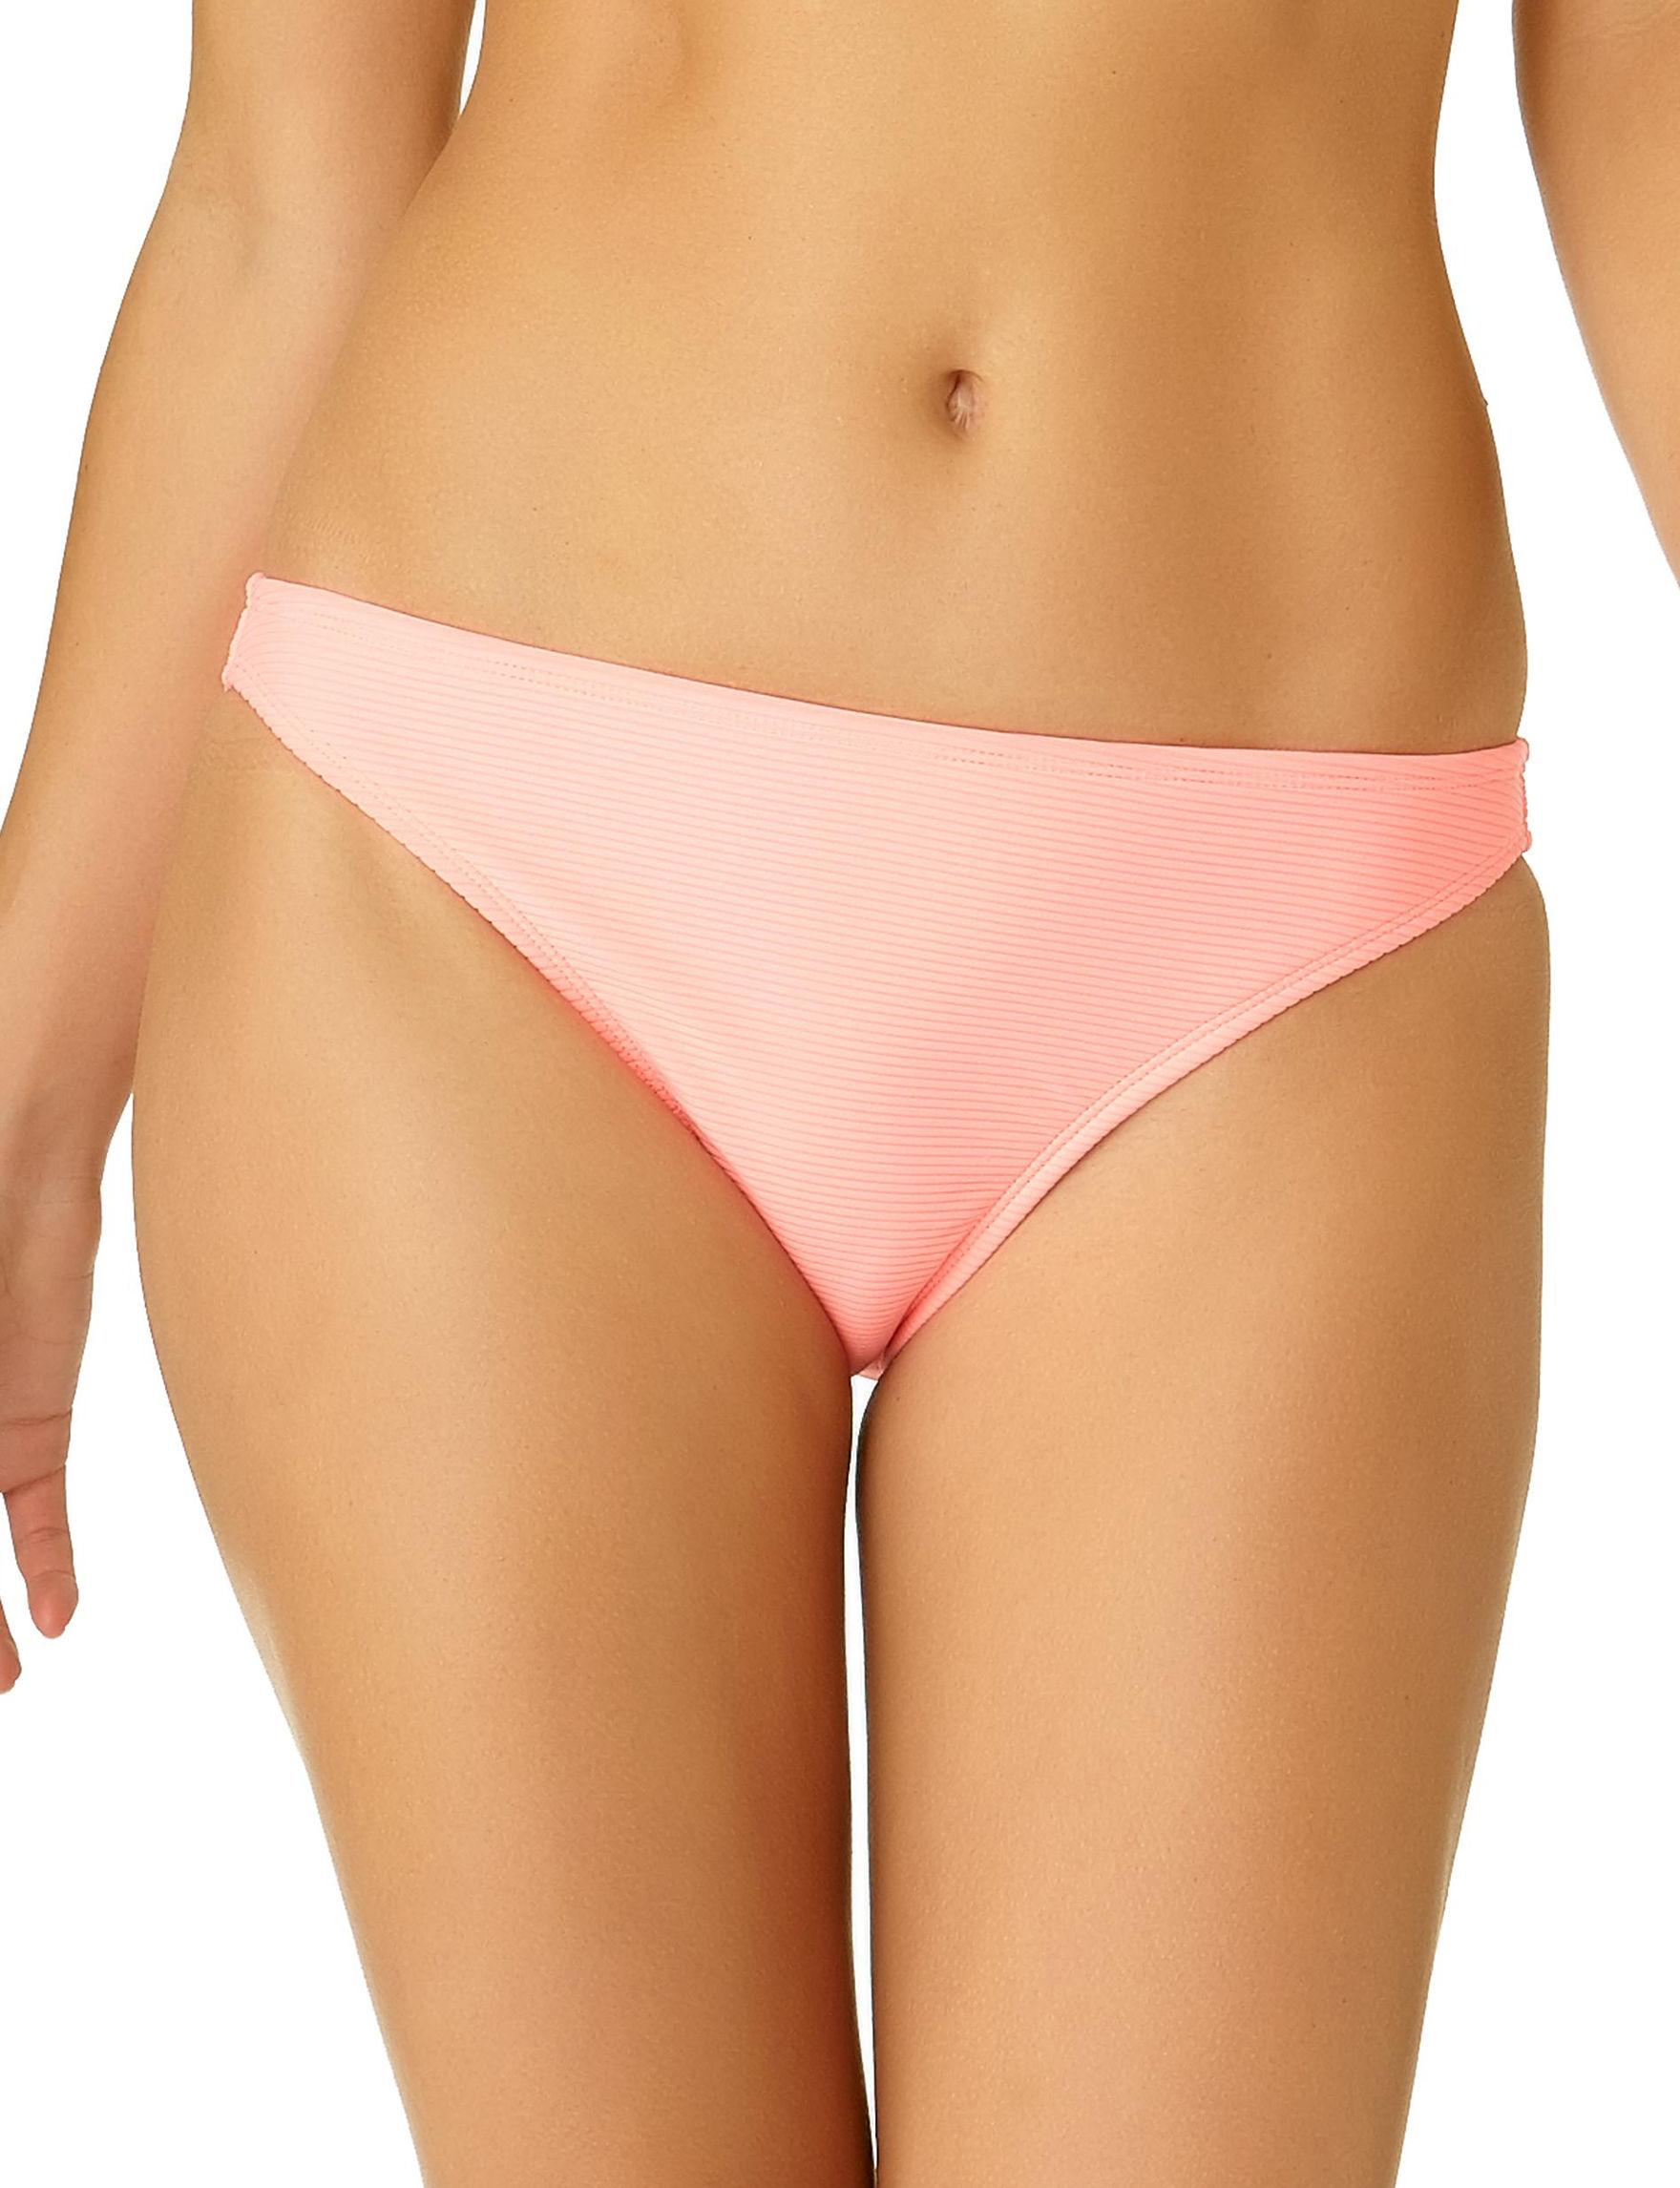 California Sunshine Neon Pink Swimsuit Bottoms Hipster